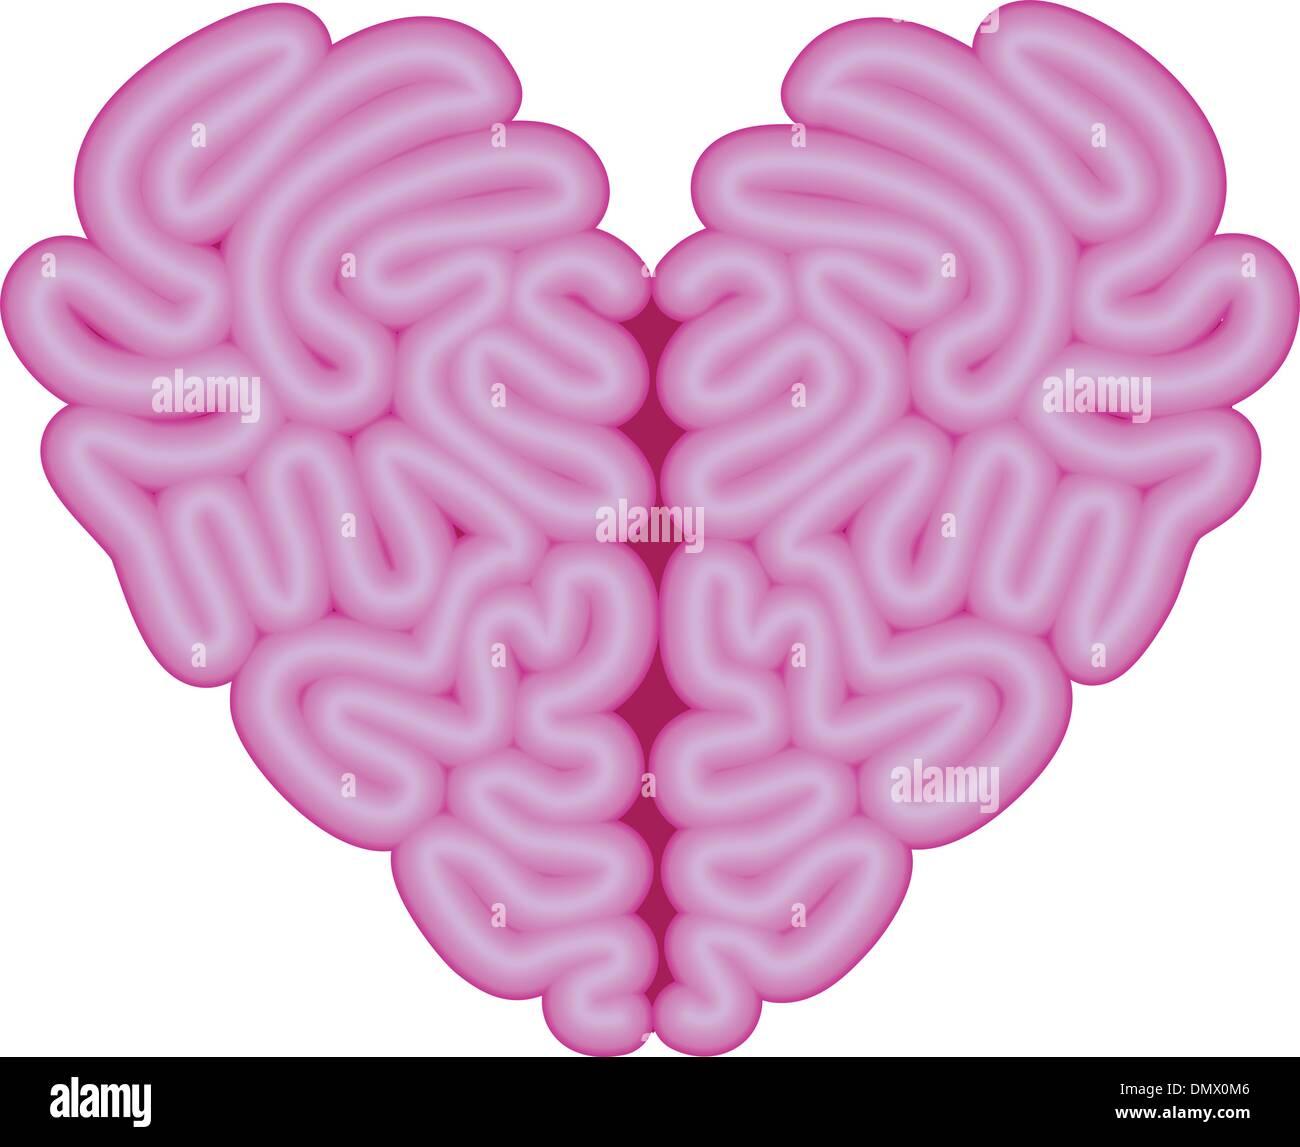 heart brain, vector - Stock Image